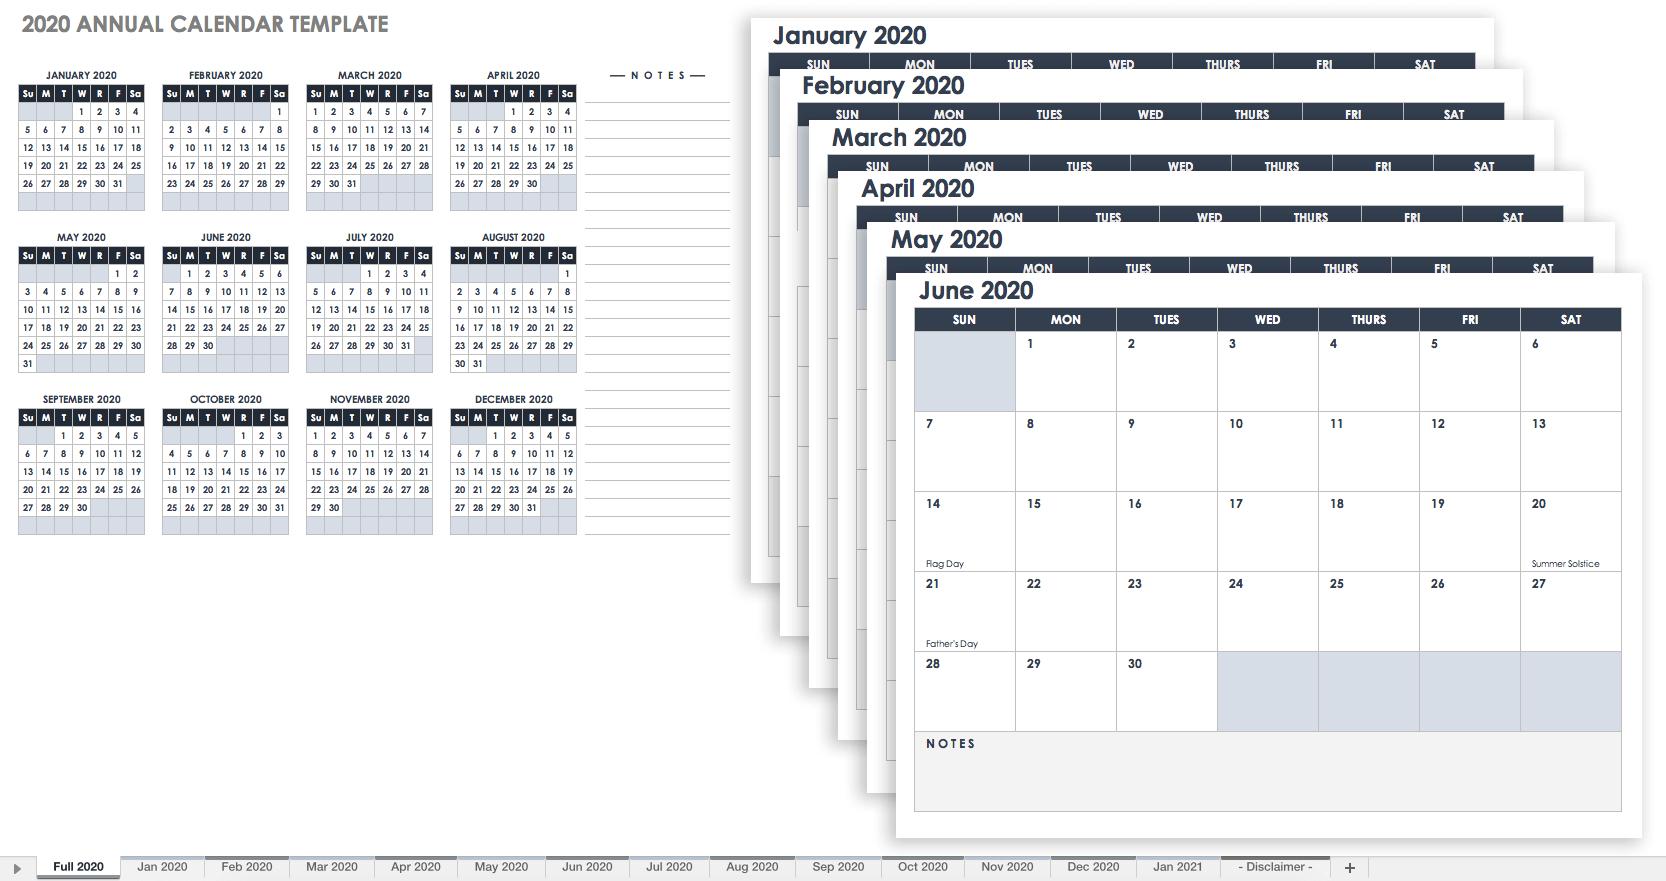 15 Free Monthly Calendar Templates | Smartsheet pertaining to Vetex 2020 Word Calendar Download